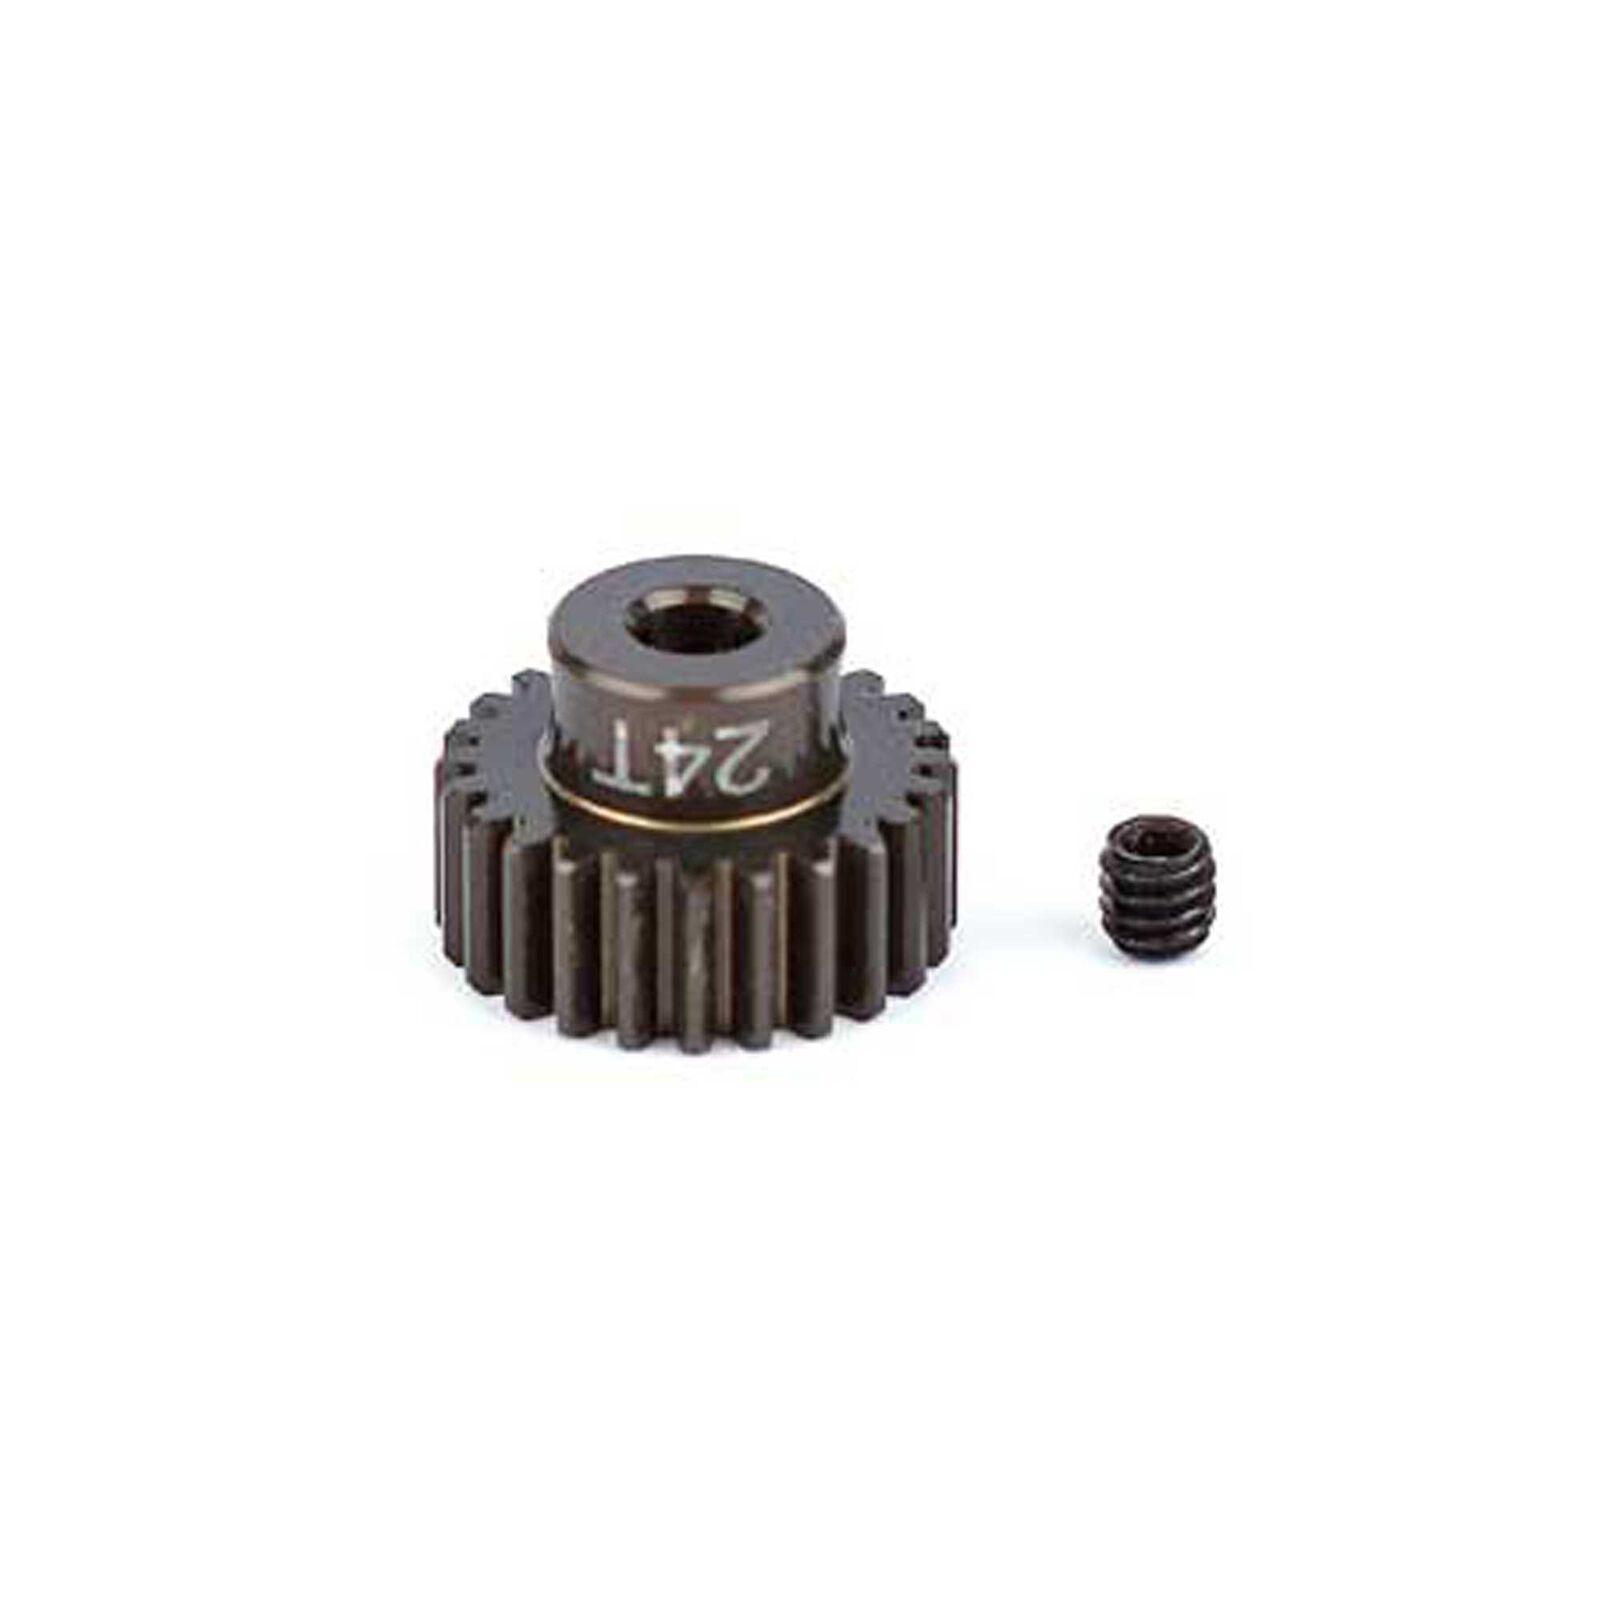 Factory Team Aluminum Pinion Gear, 24T, 48P, 1/8 shaft